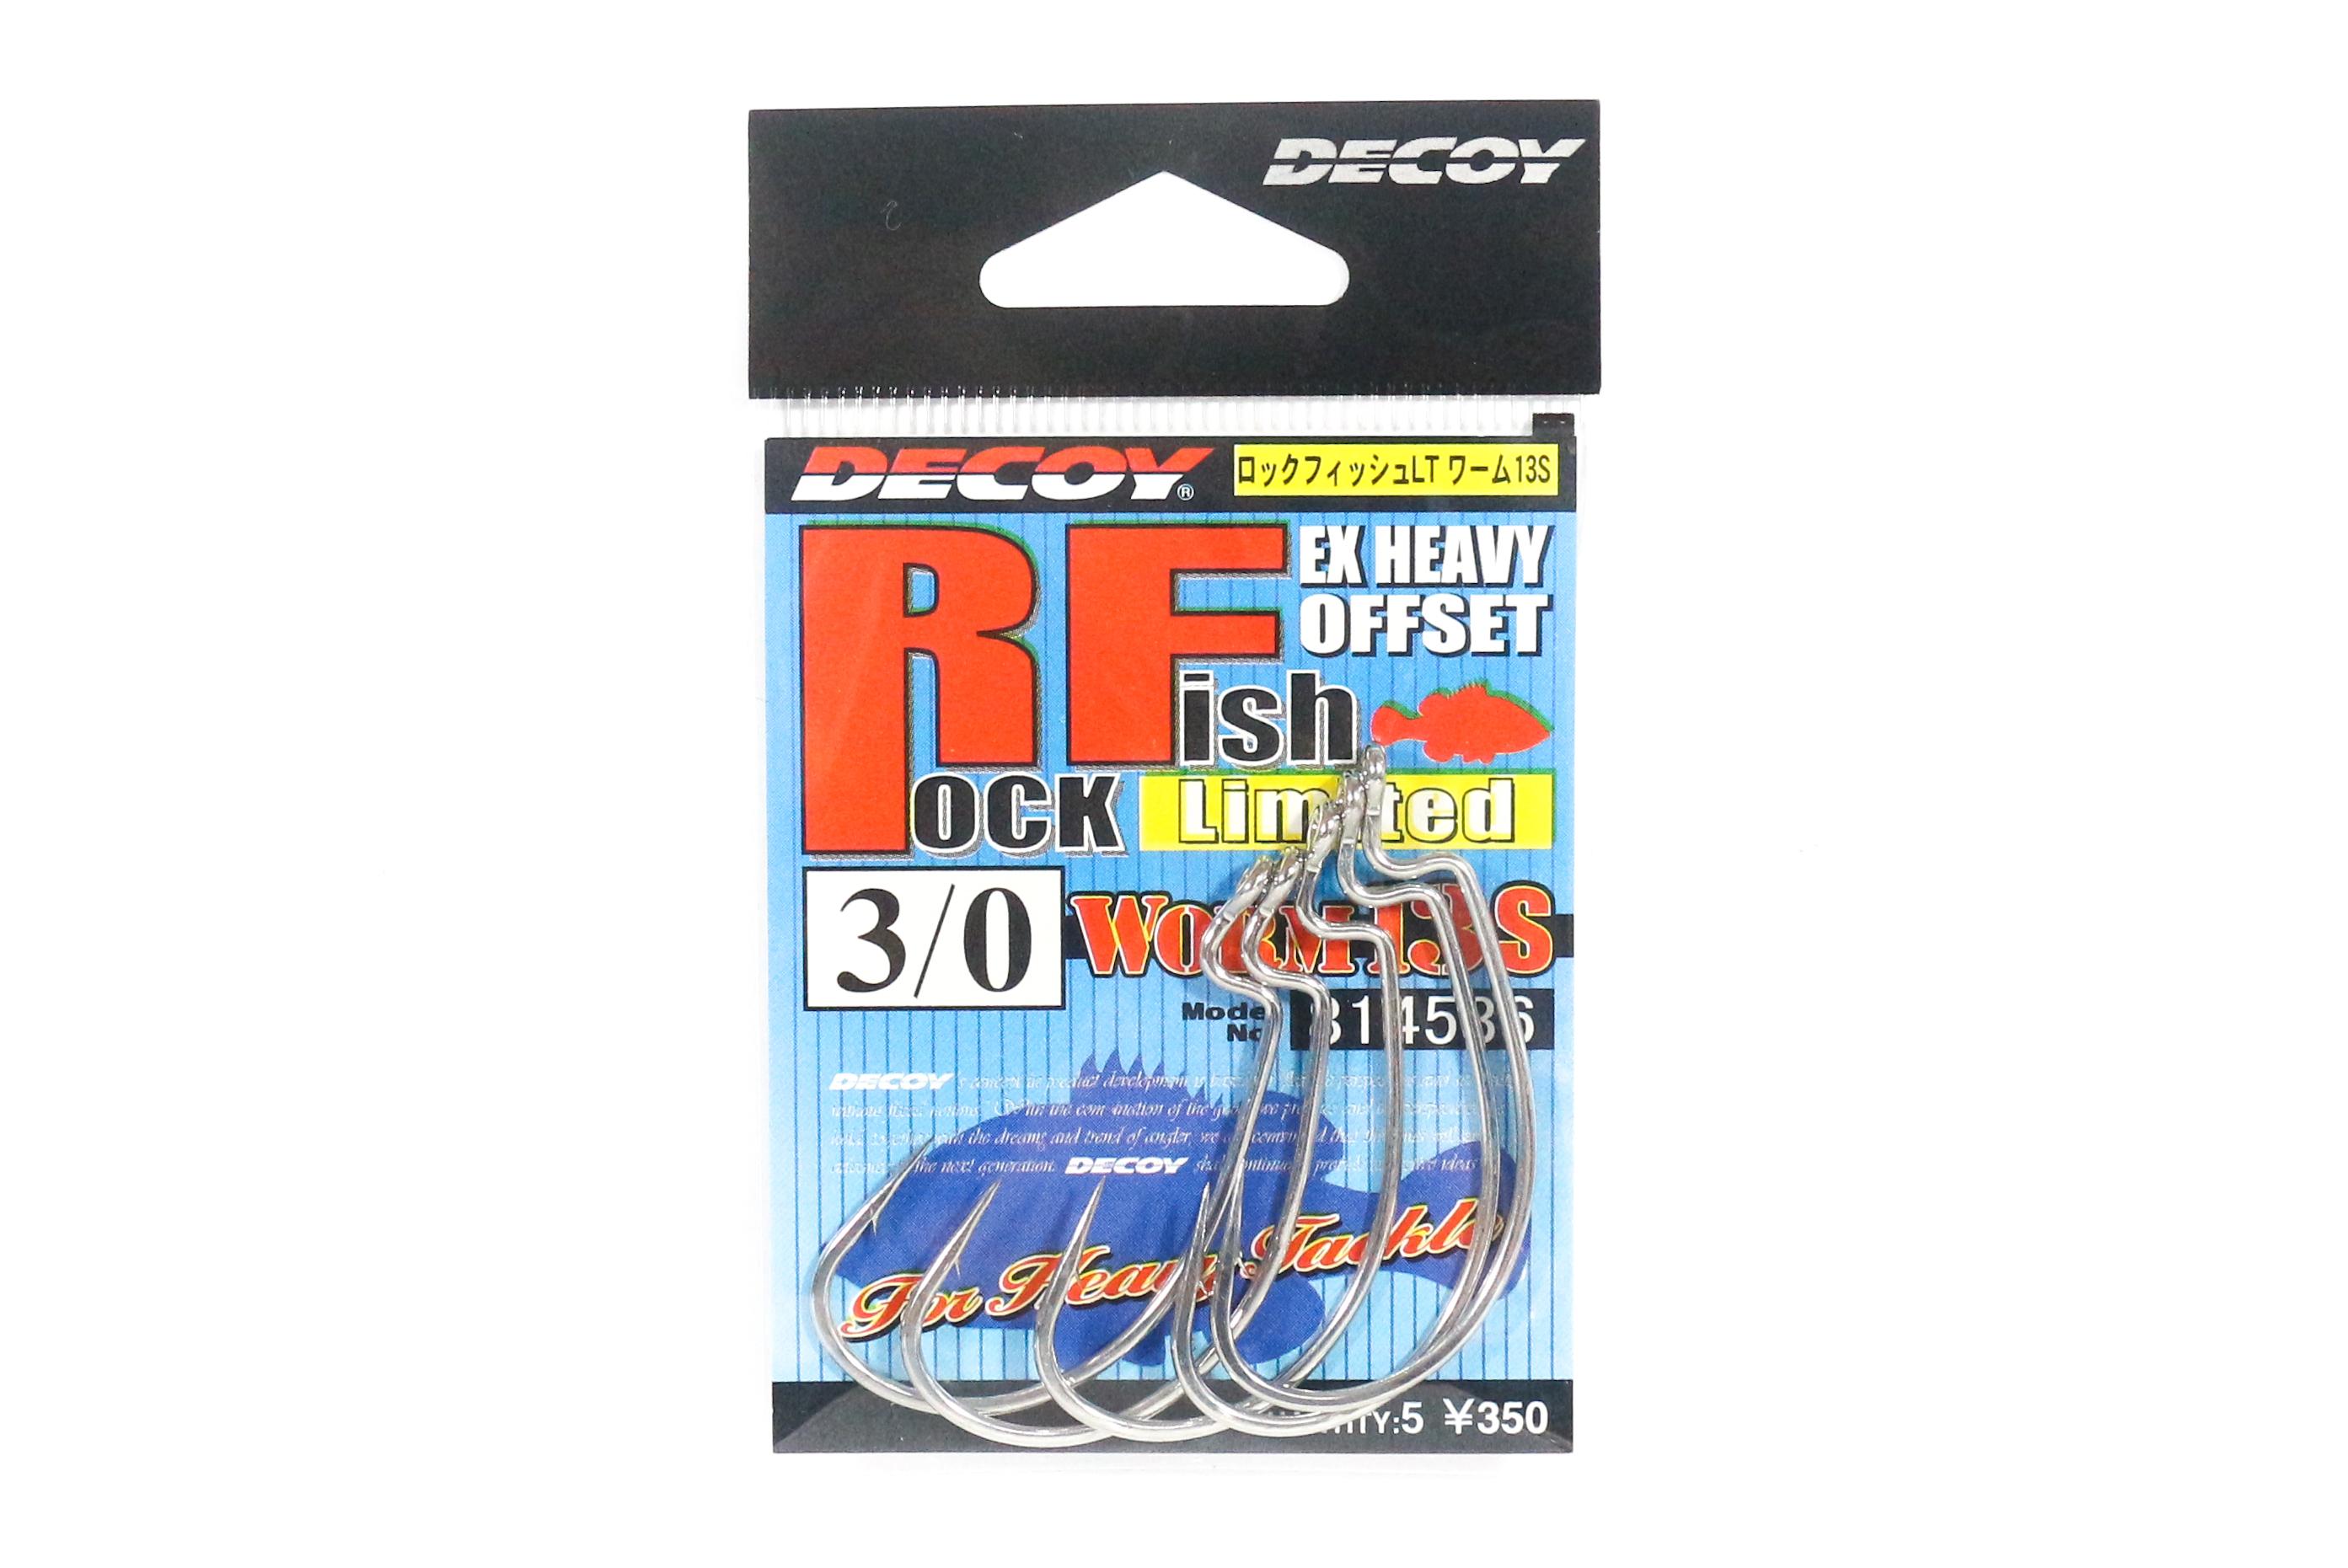 Decoy Worm 13S Rock Fish Ltd Extra Heavy Duty Worm Hooks Size 3/0 (4536)